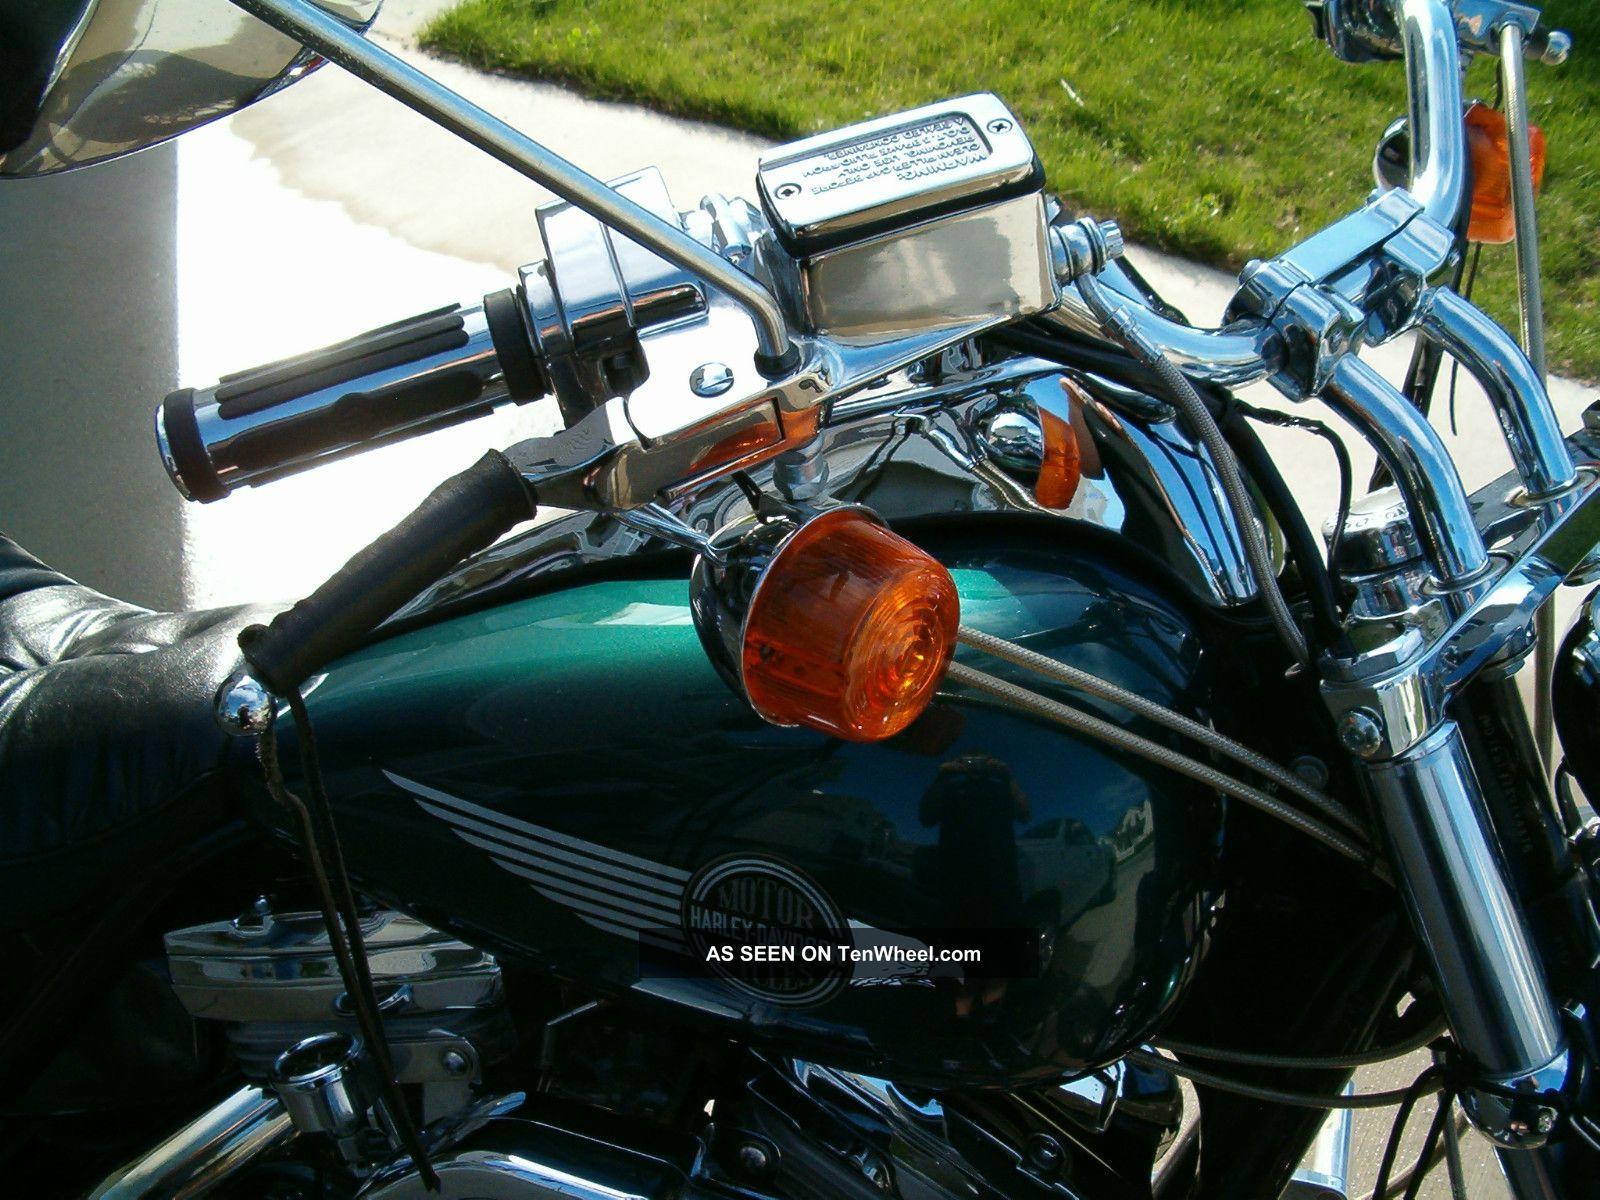 1986 Harley Davidson Low Rider Fxr Custom - Lots Of Chrome And